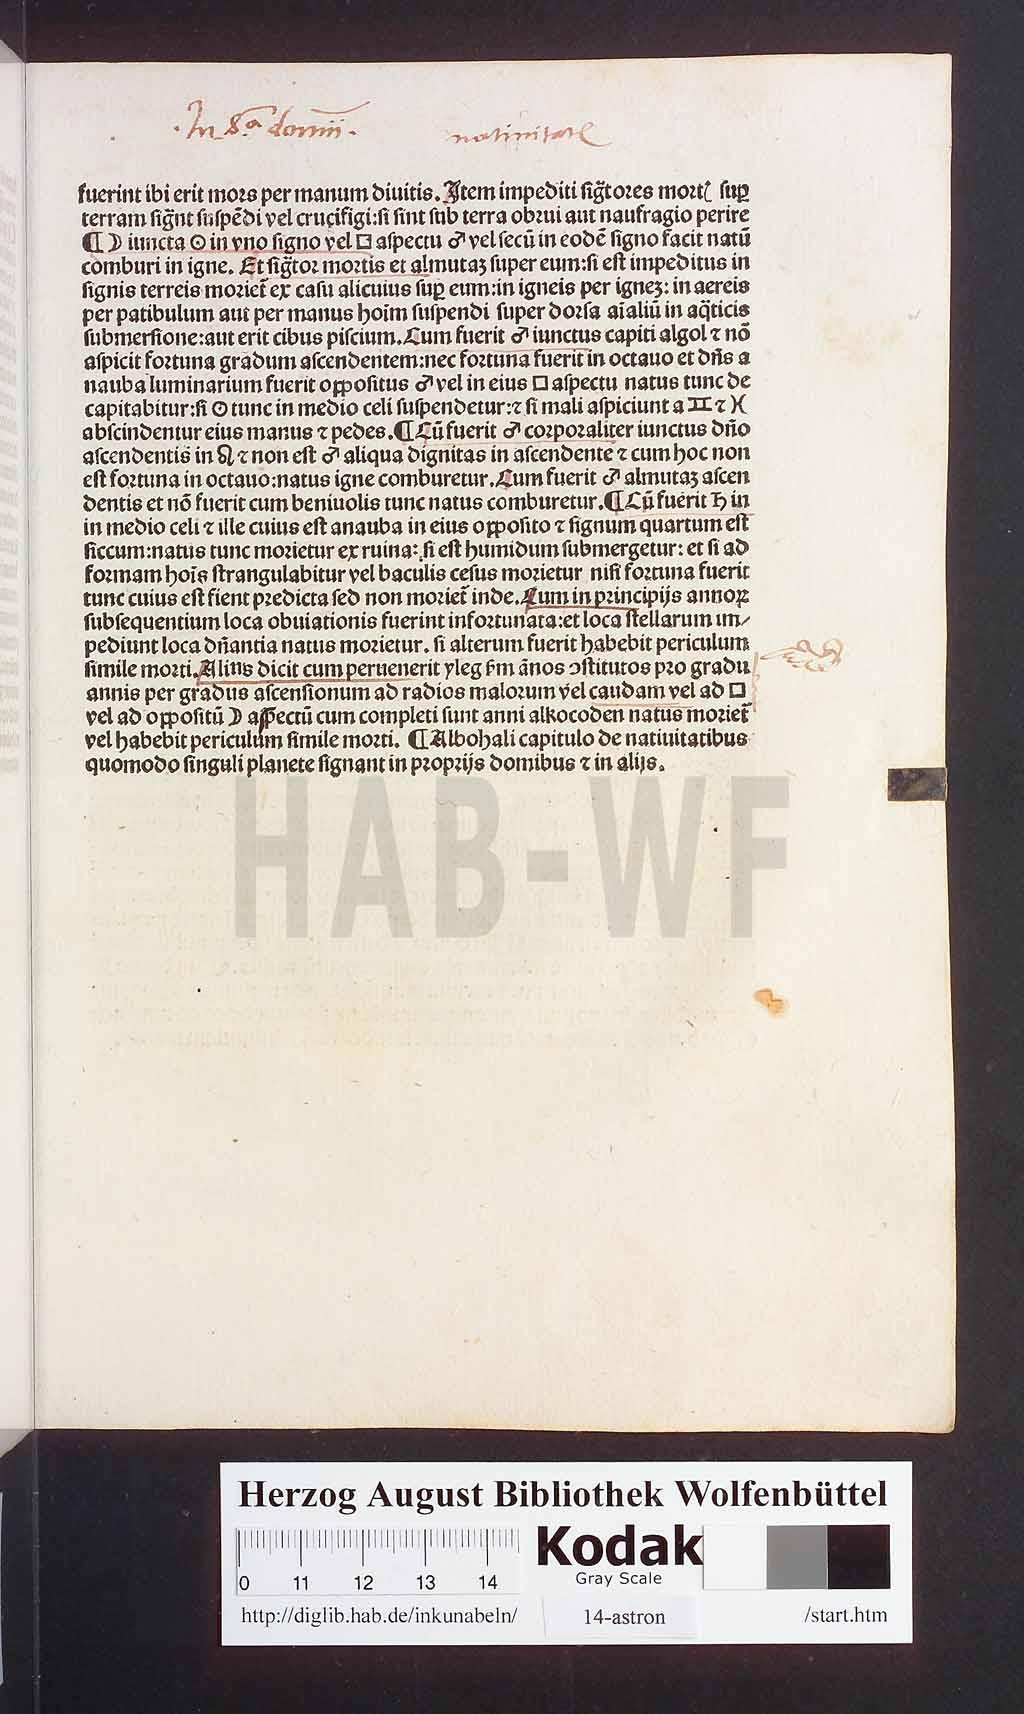 http://diglib.hab.de/inkunabeln/14-astron/00143.jpg